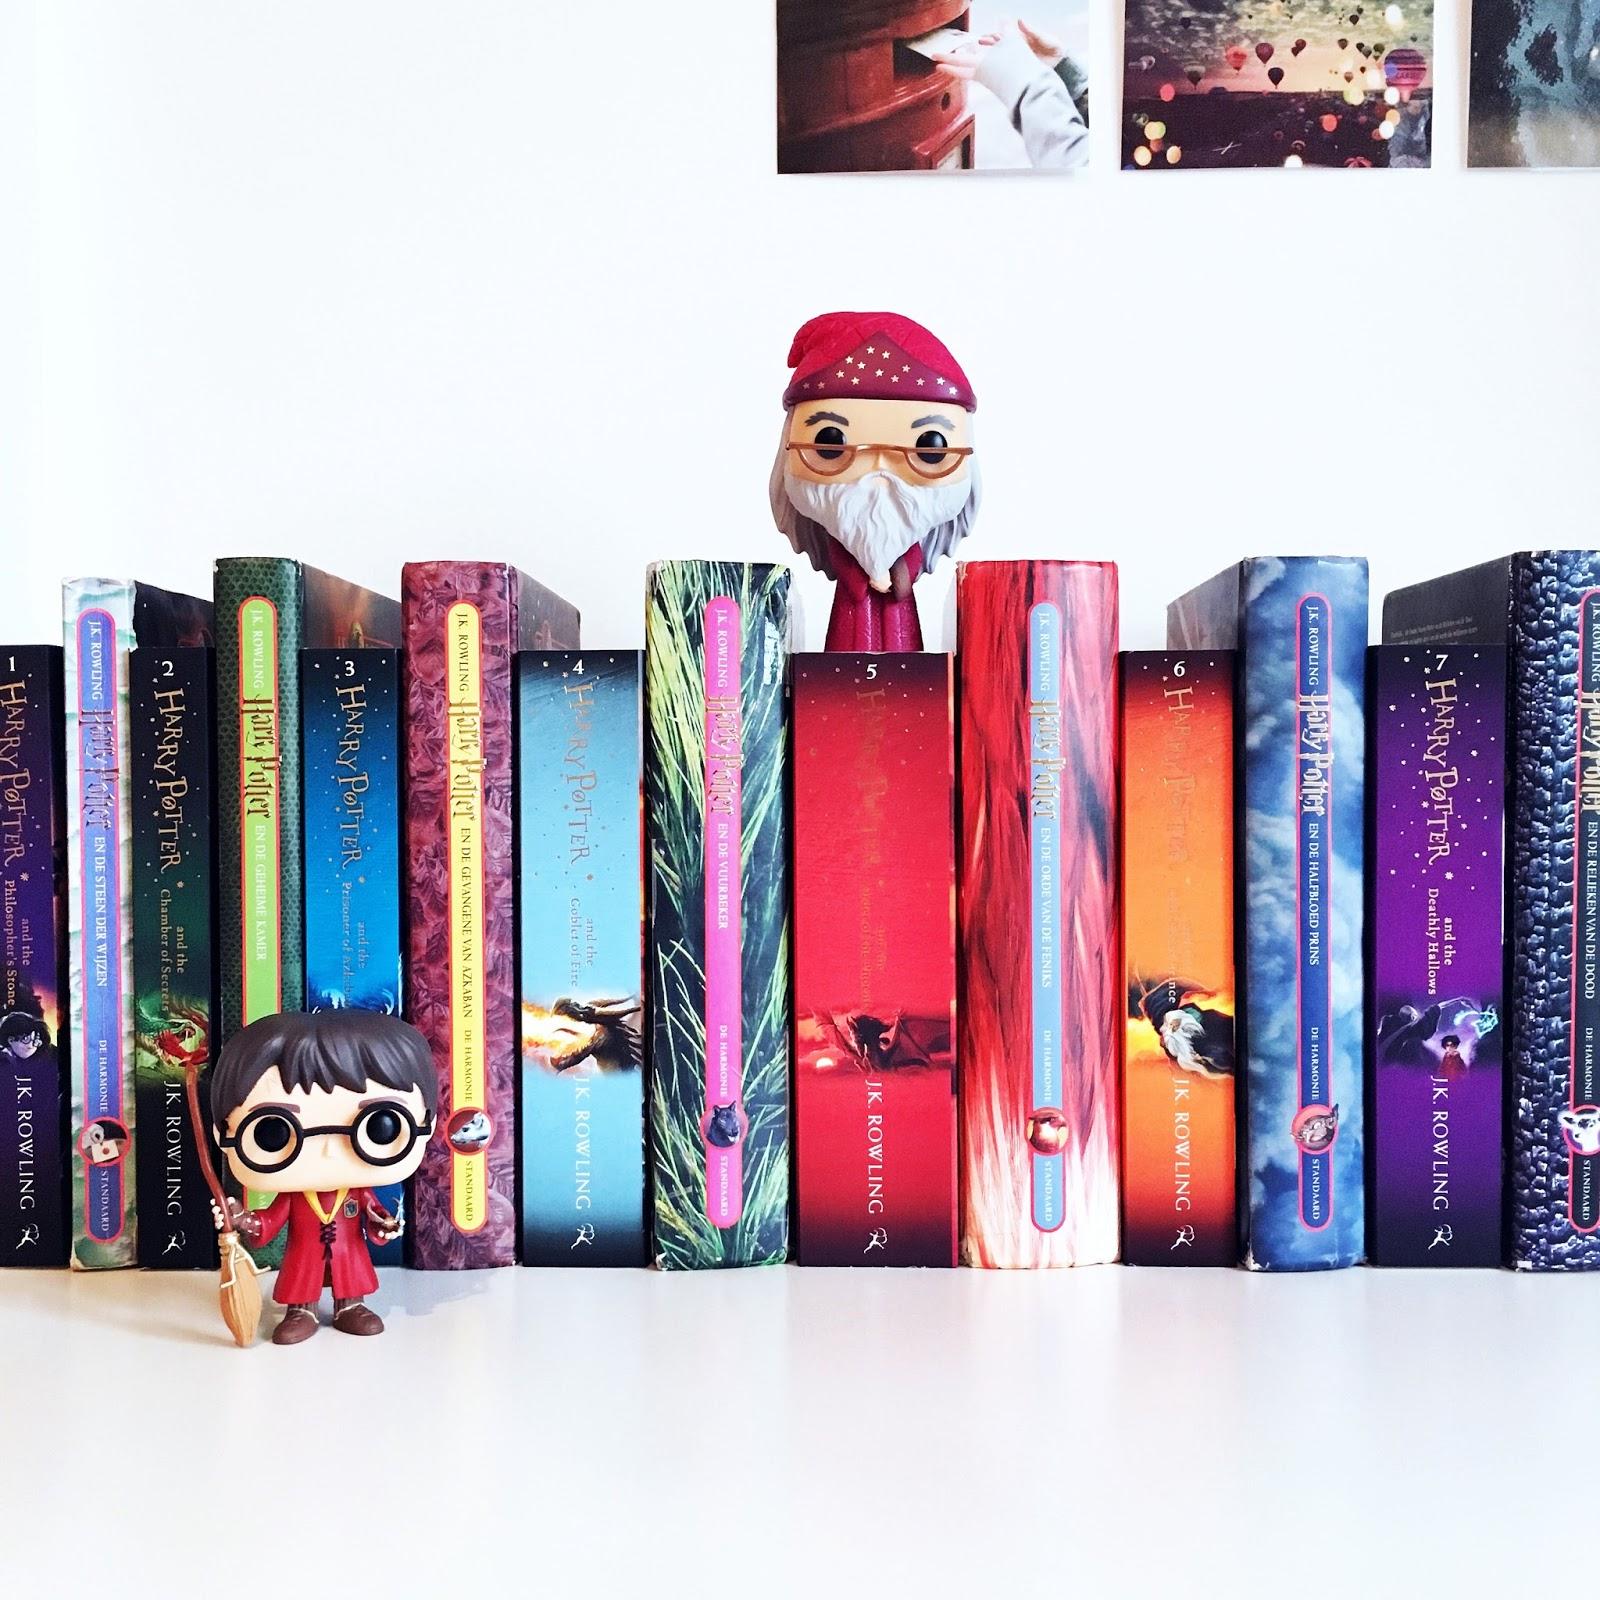 Harry Potter J.K. Rowling Dumbledore Perkamentus